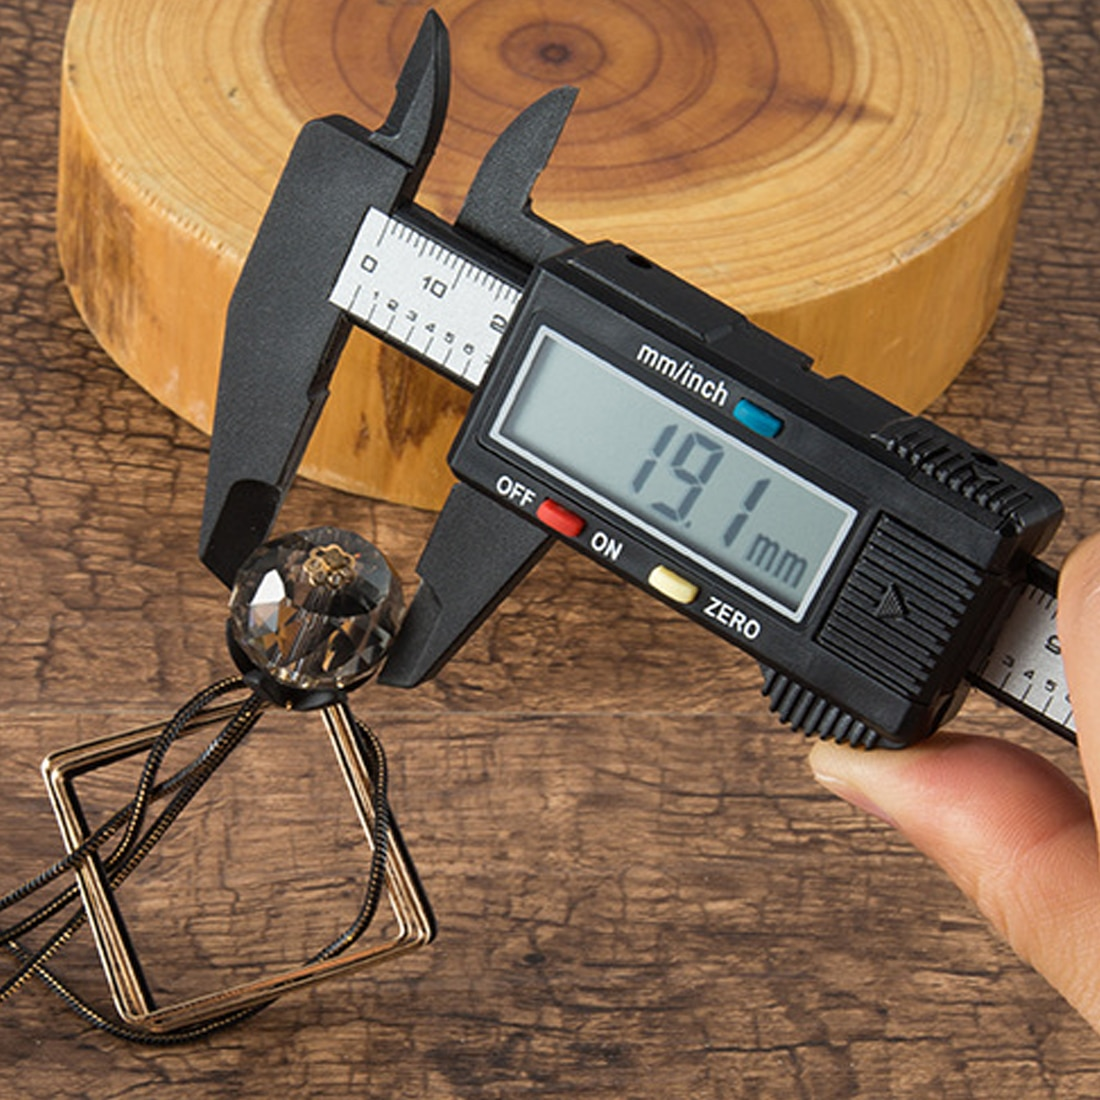 Micrometer Ruler Vernier Caliper Gauge 150mm 6inch LCD Digital Electronic Carbon Fiber Composite Tester